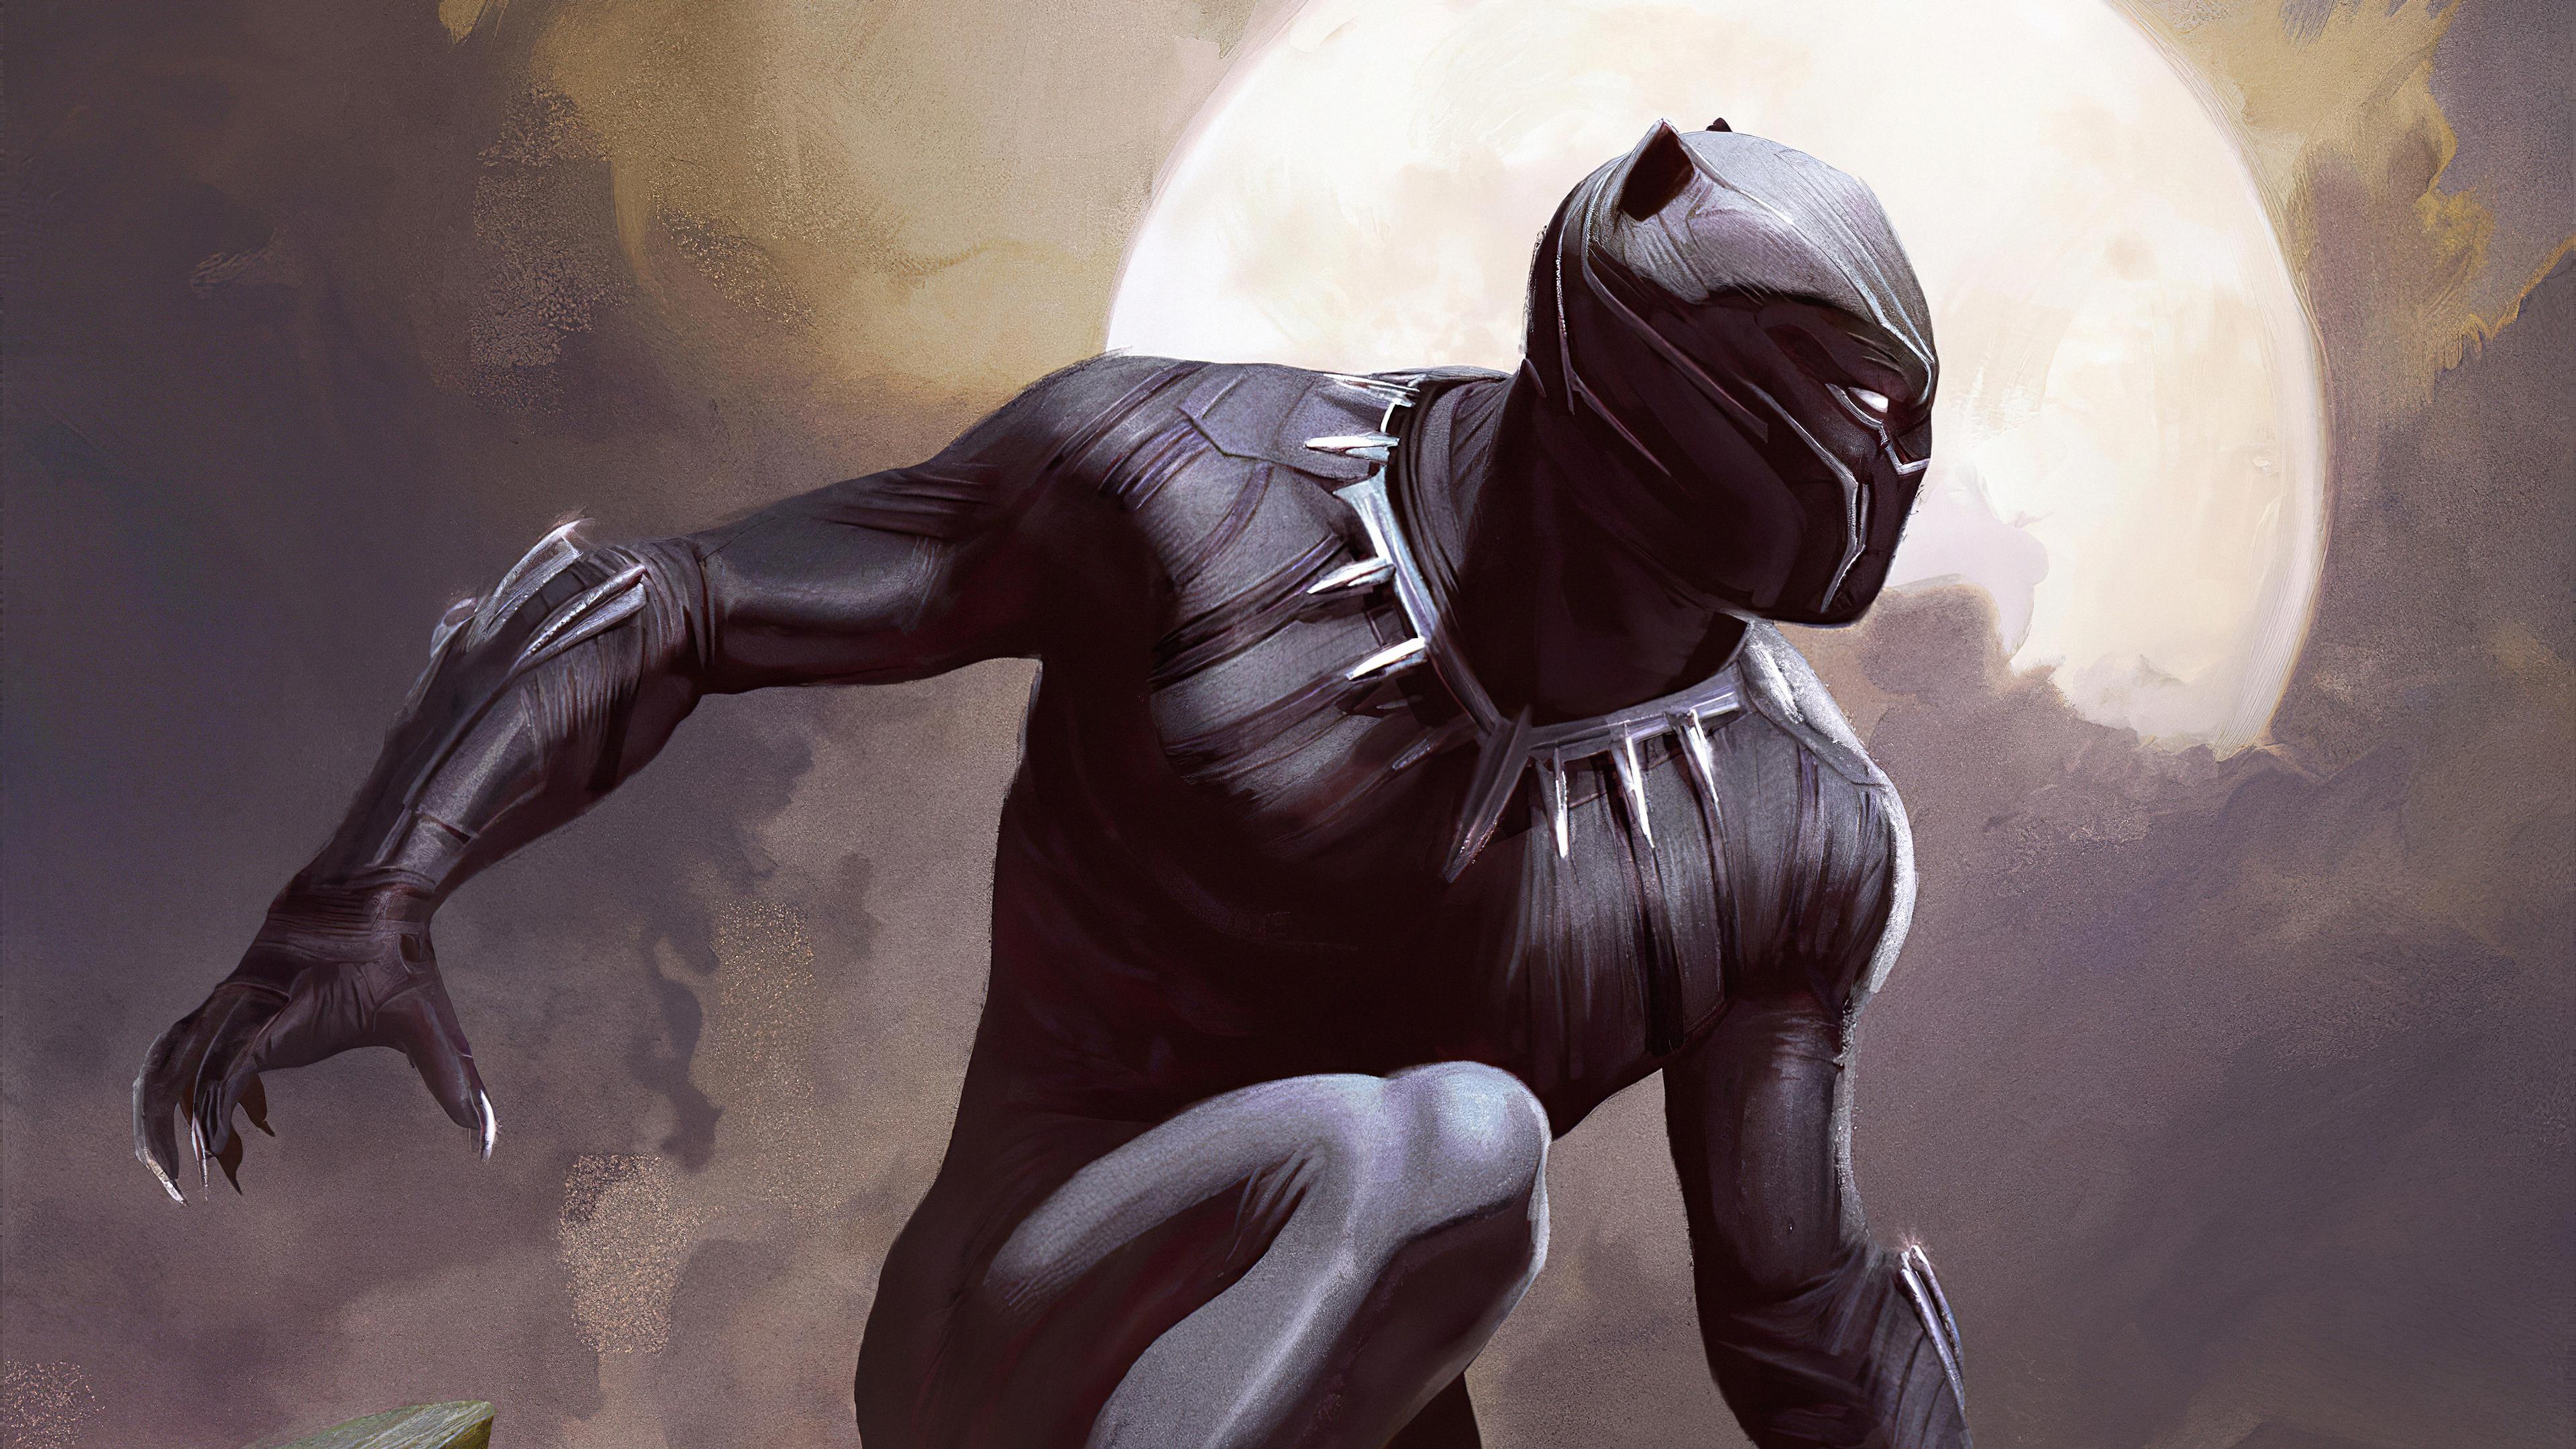 Wallpaper 4k Black Panther Artwork Black Panther 4k Wallpaper Black Panther Art Wallpaper Hd 4k Black Panther Ultra Hd Wallpaper 4k Black Panther Wallpaper